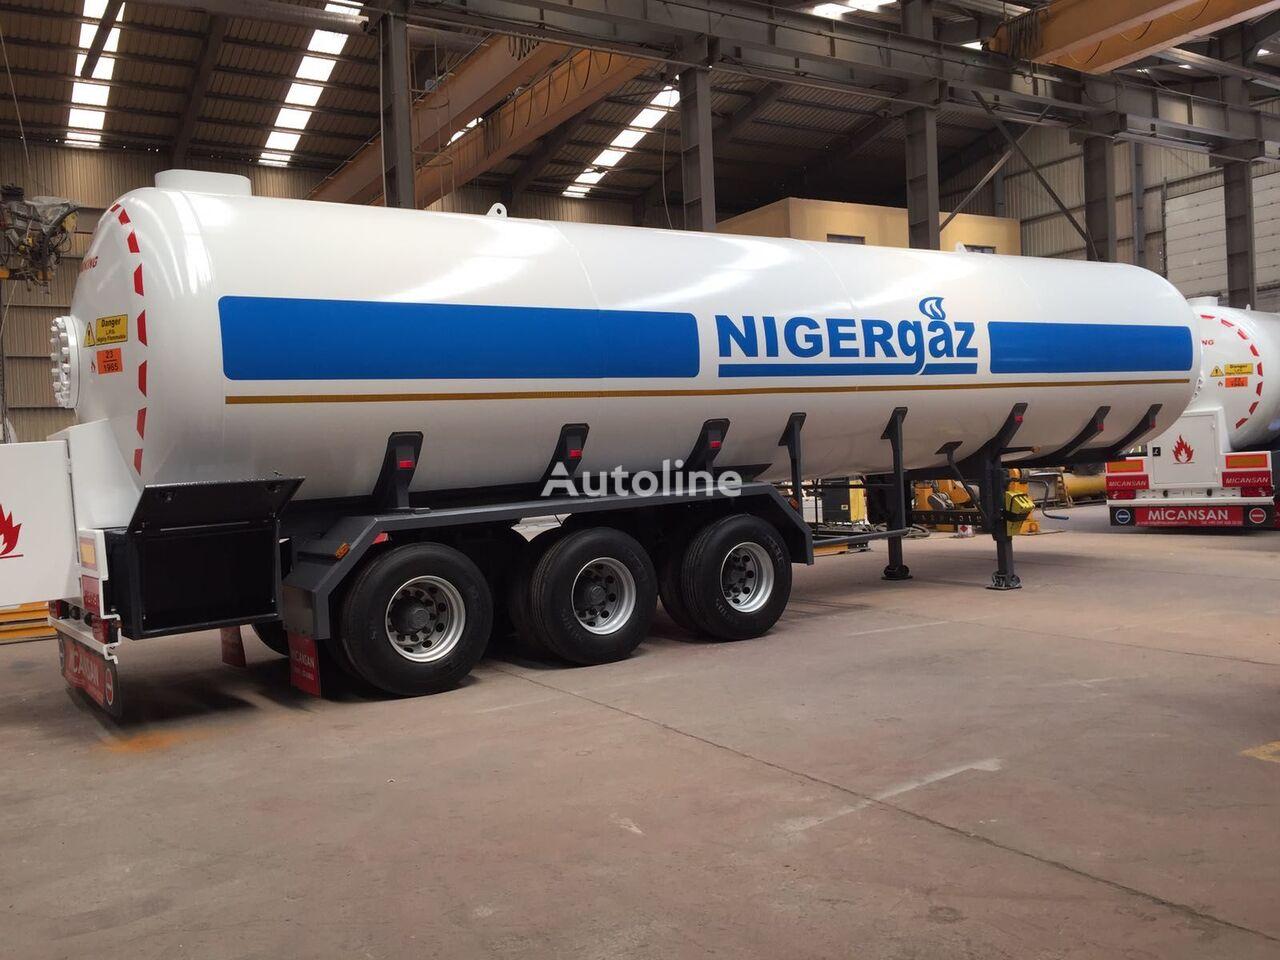 nova Micansan BIG DISCOUNT 2019 57 M3 SPECIAL 2 AXLE BOGGIE+ 1 AXLE SPRING LEA cisterna za gas